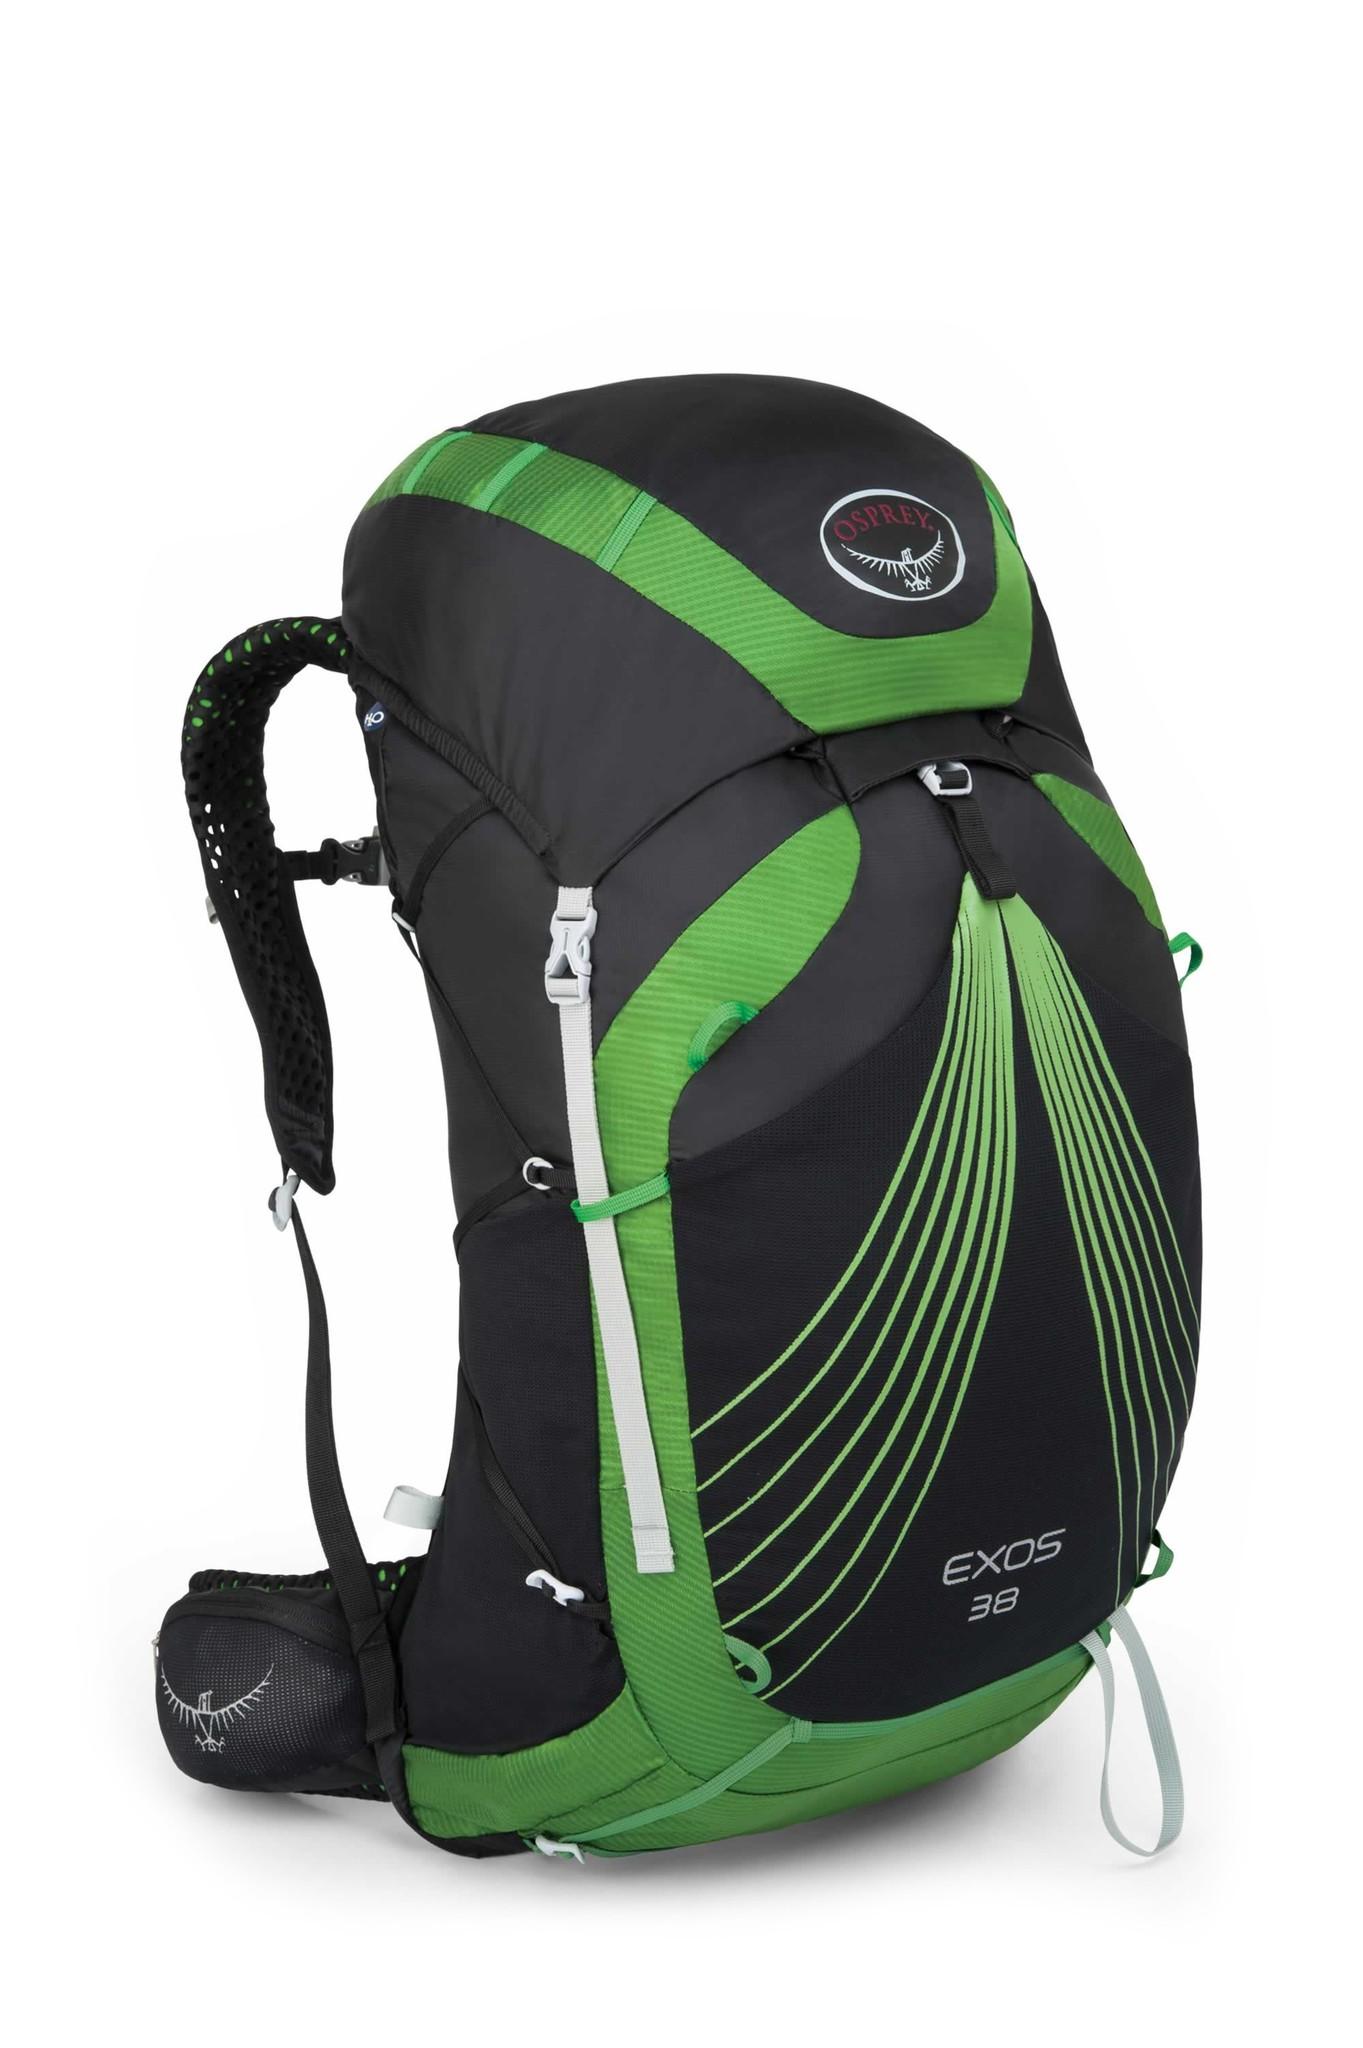 Туристические рюкзаки Рюкзак туристический Osprey Exos 38 exos-38-basalt-black-web_5__1_.jpg